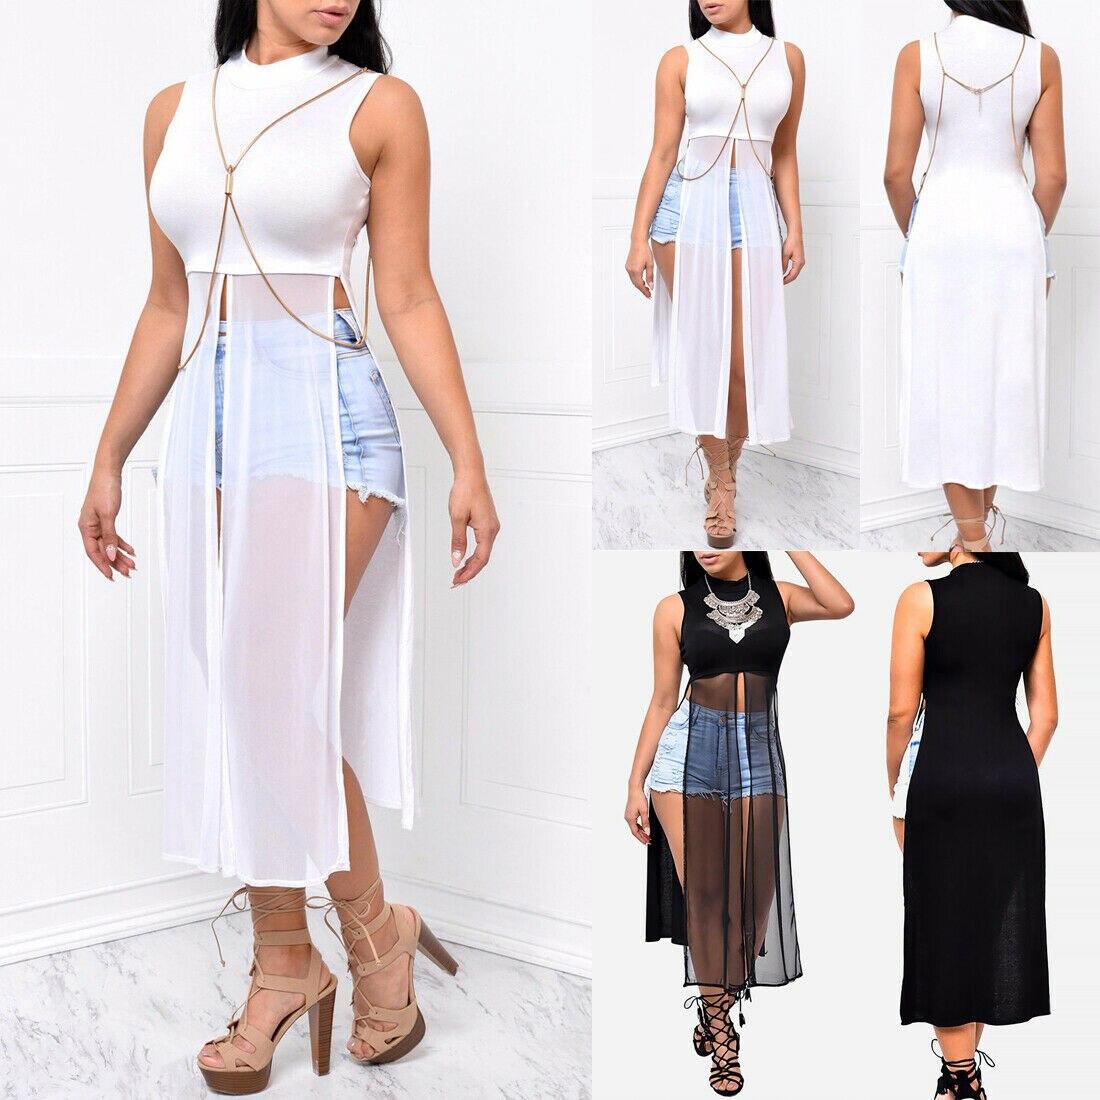 Sunny Women Ladies Sleeveless Round Neck Patchwork Mesh Split Crop Top Vest Long Dress Women's Clothing